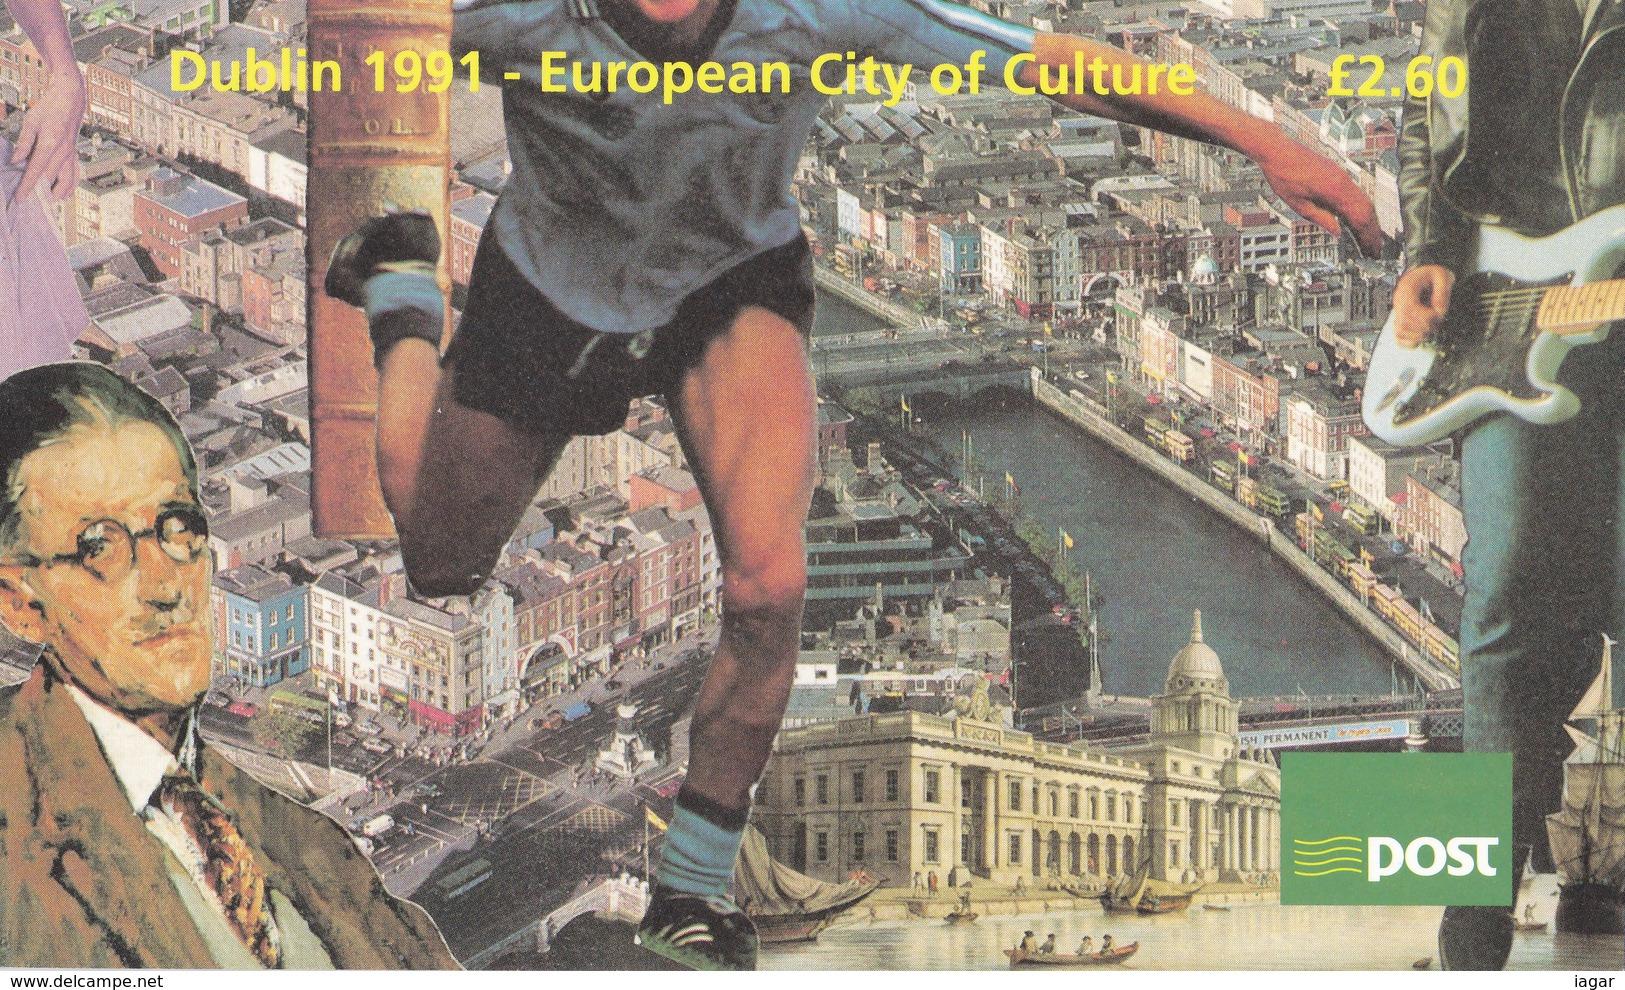 IRLANDA 1991 DUBLIN EUROPEAN CITY OF CULTURE - Libretti